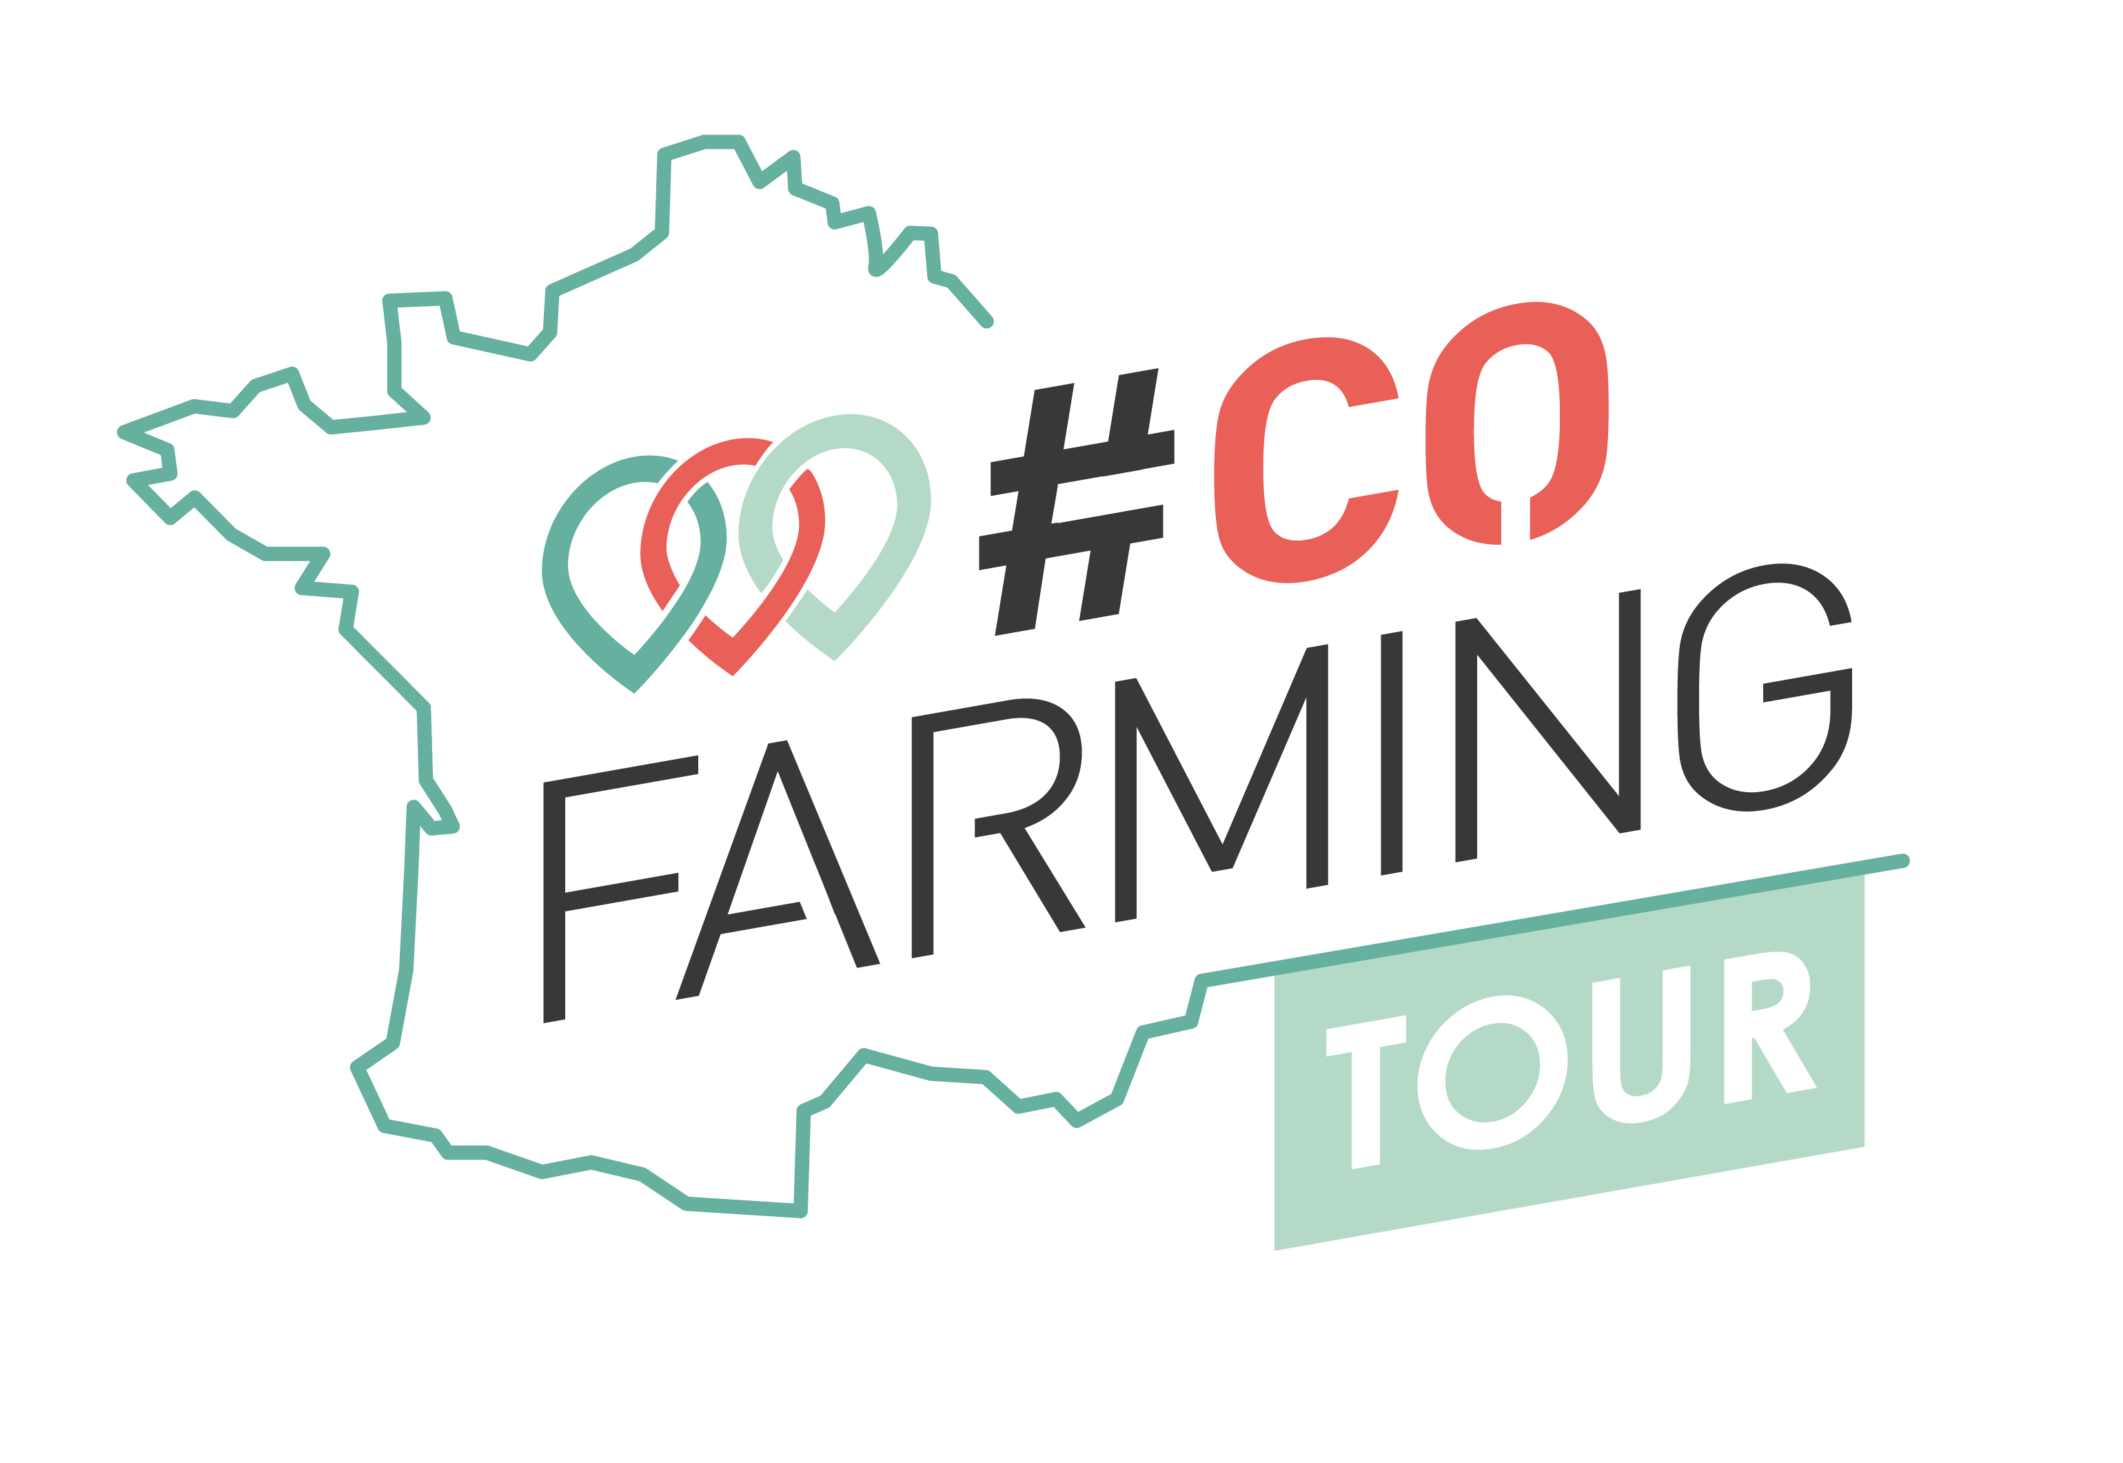 cofarming-tour-logo-COULEUR-rogne